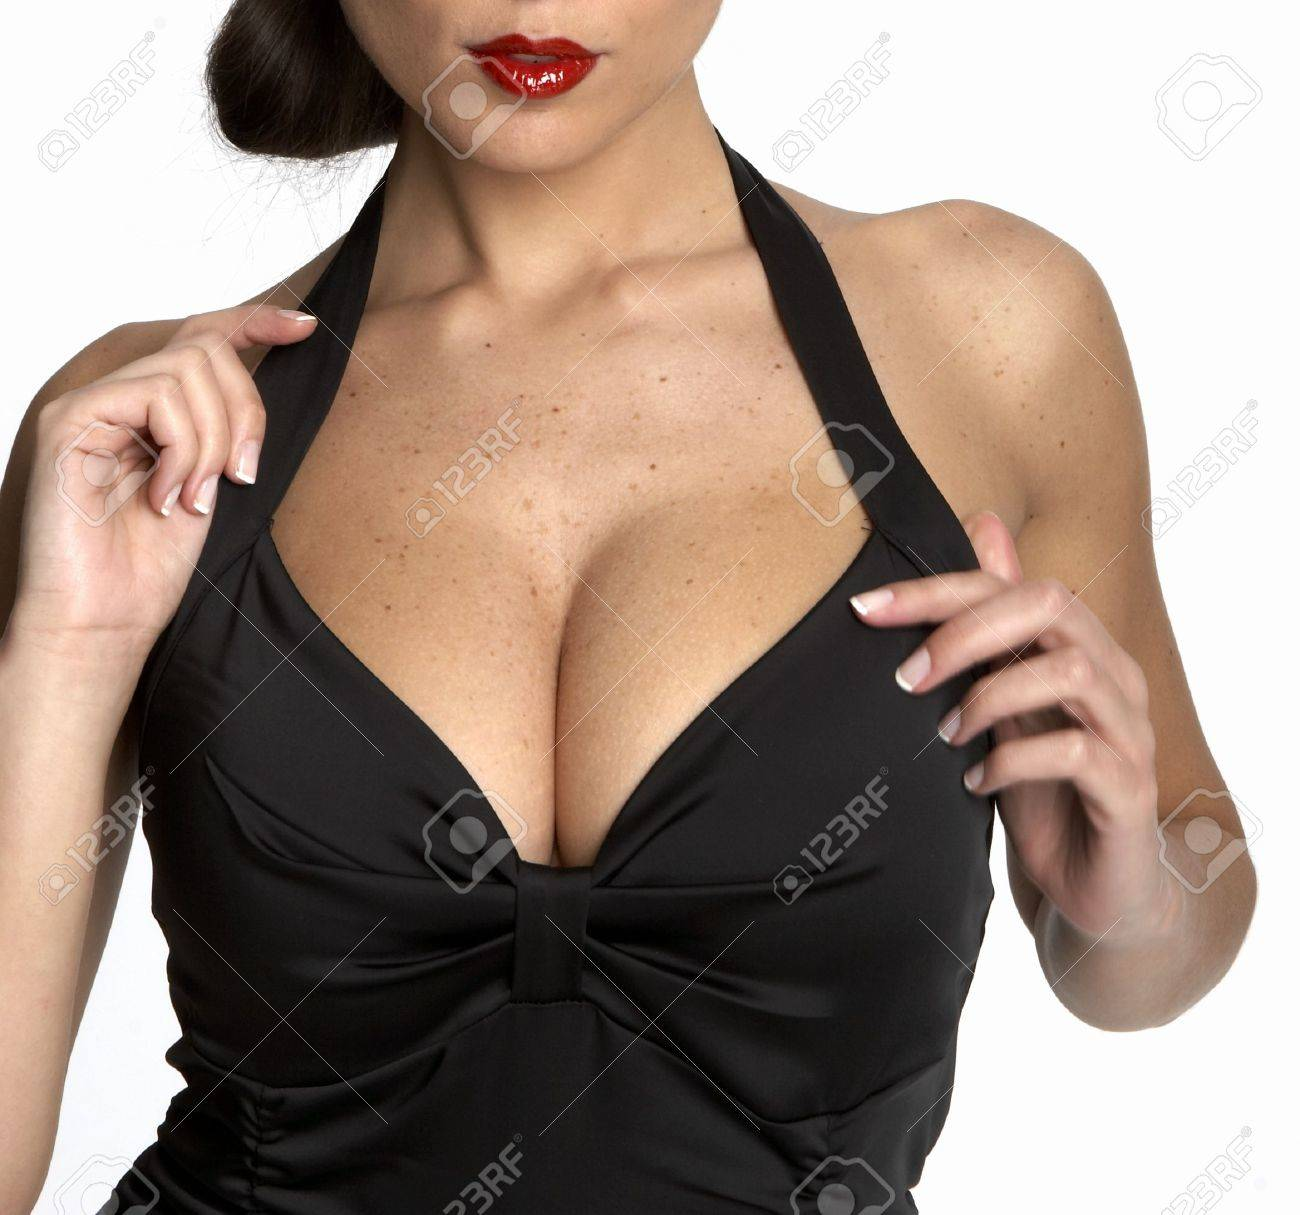 Porno egypt pornbebo twitter XXX